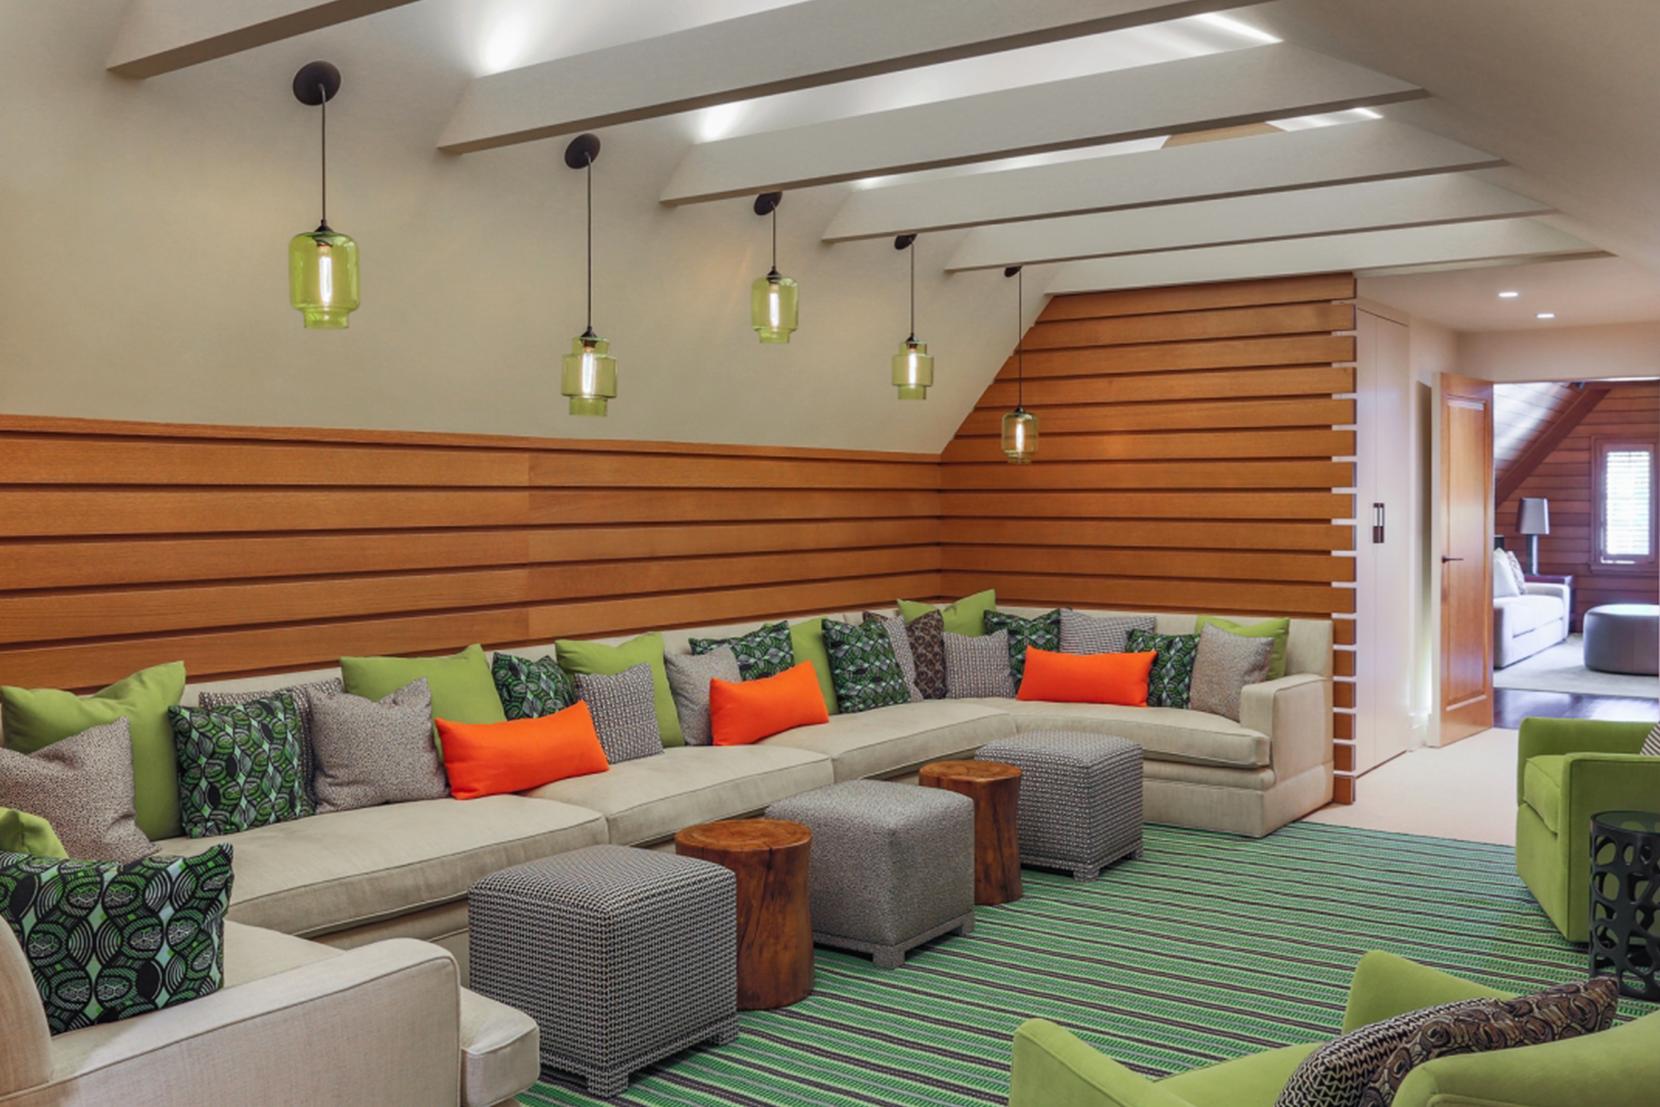 Modern Glass Living Room Lighting - Chartreuse CrystallinePendant Lights